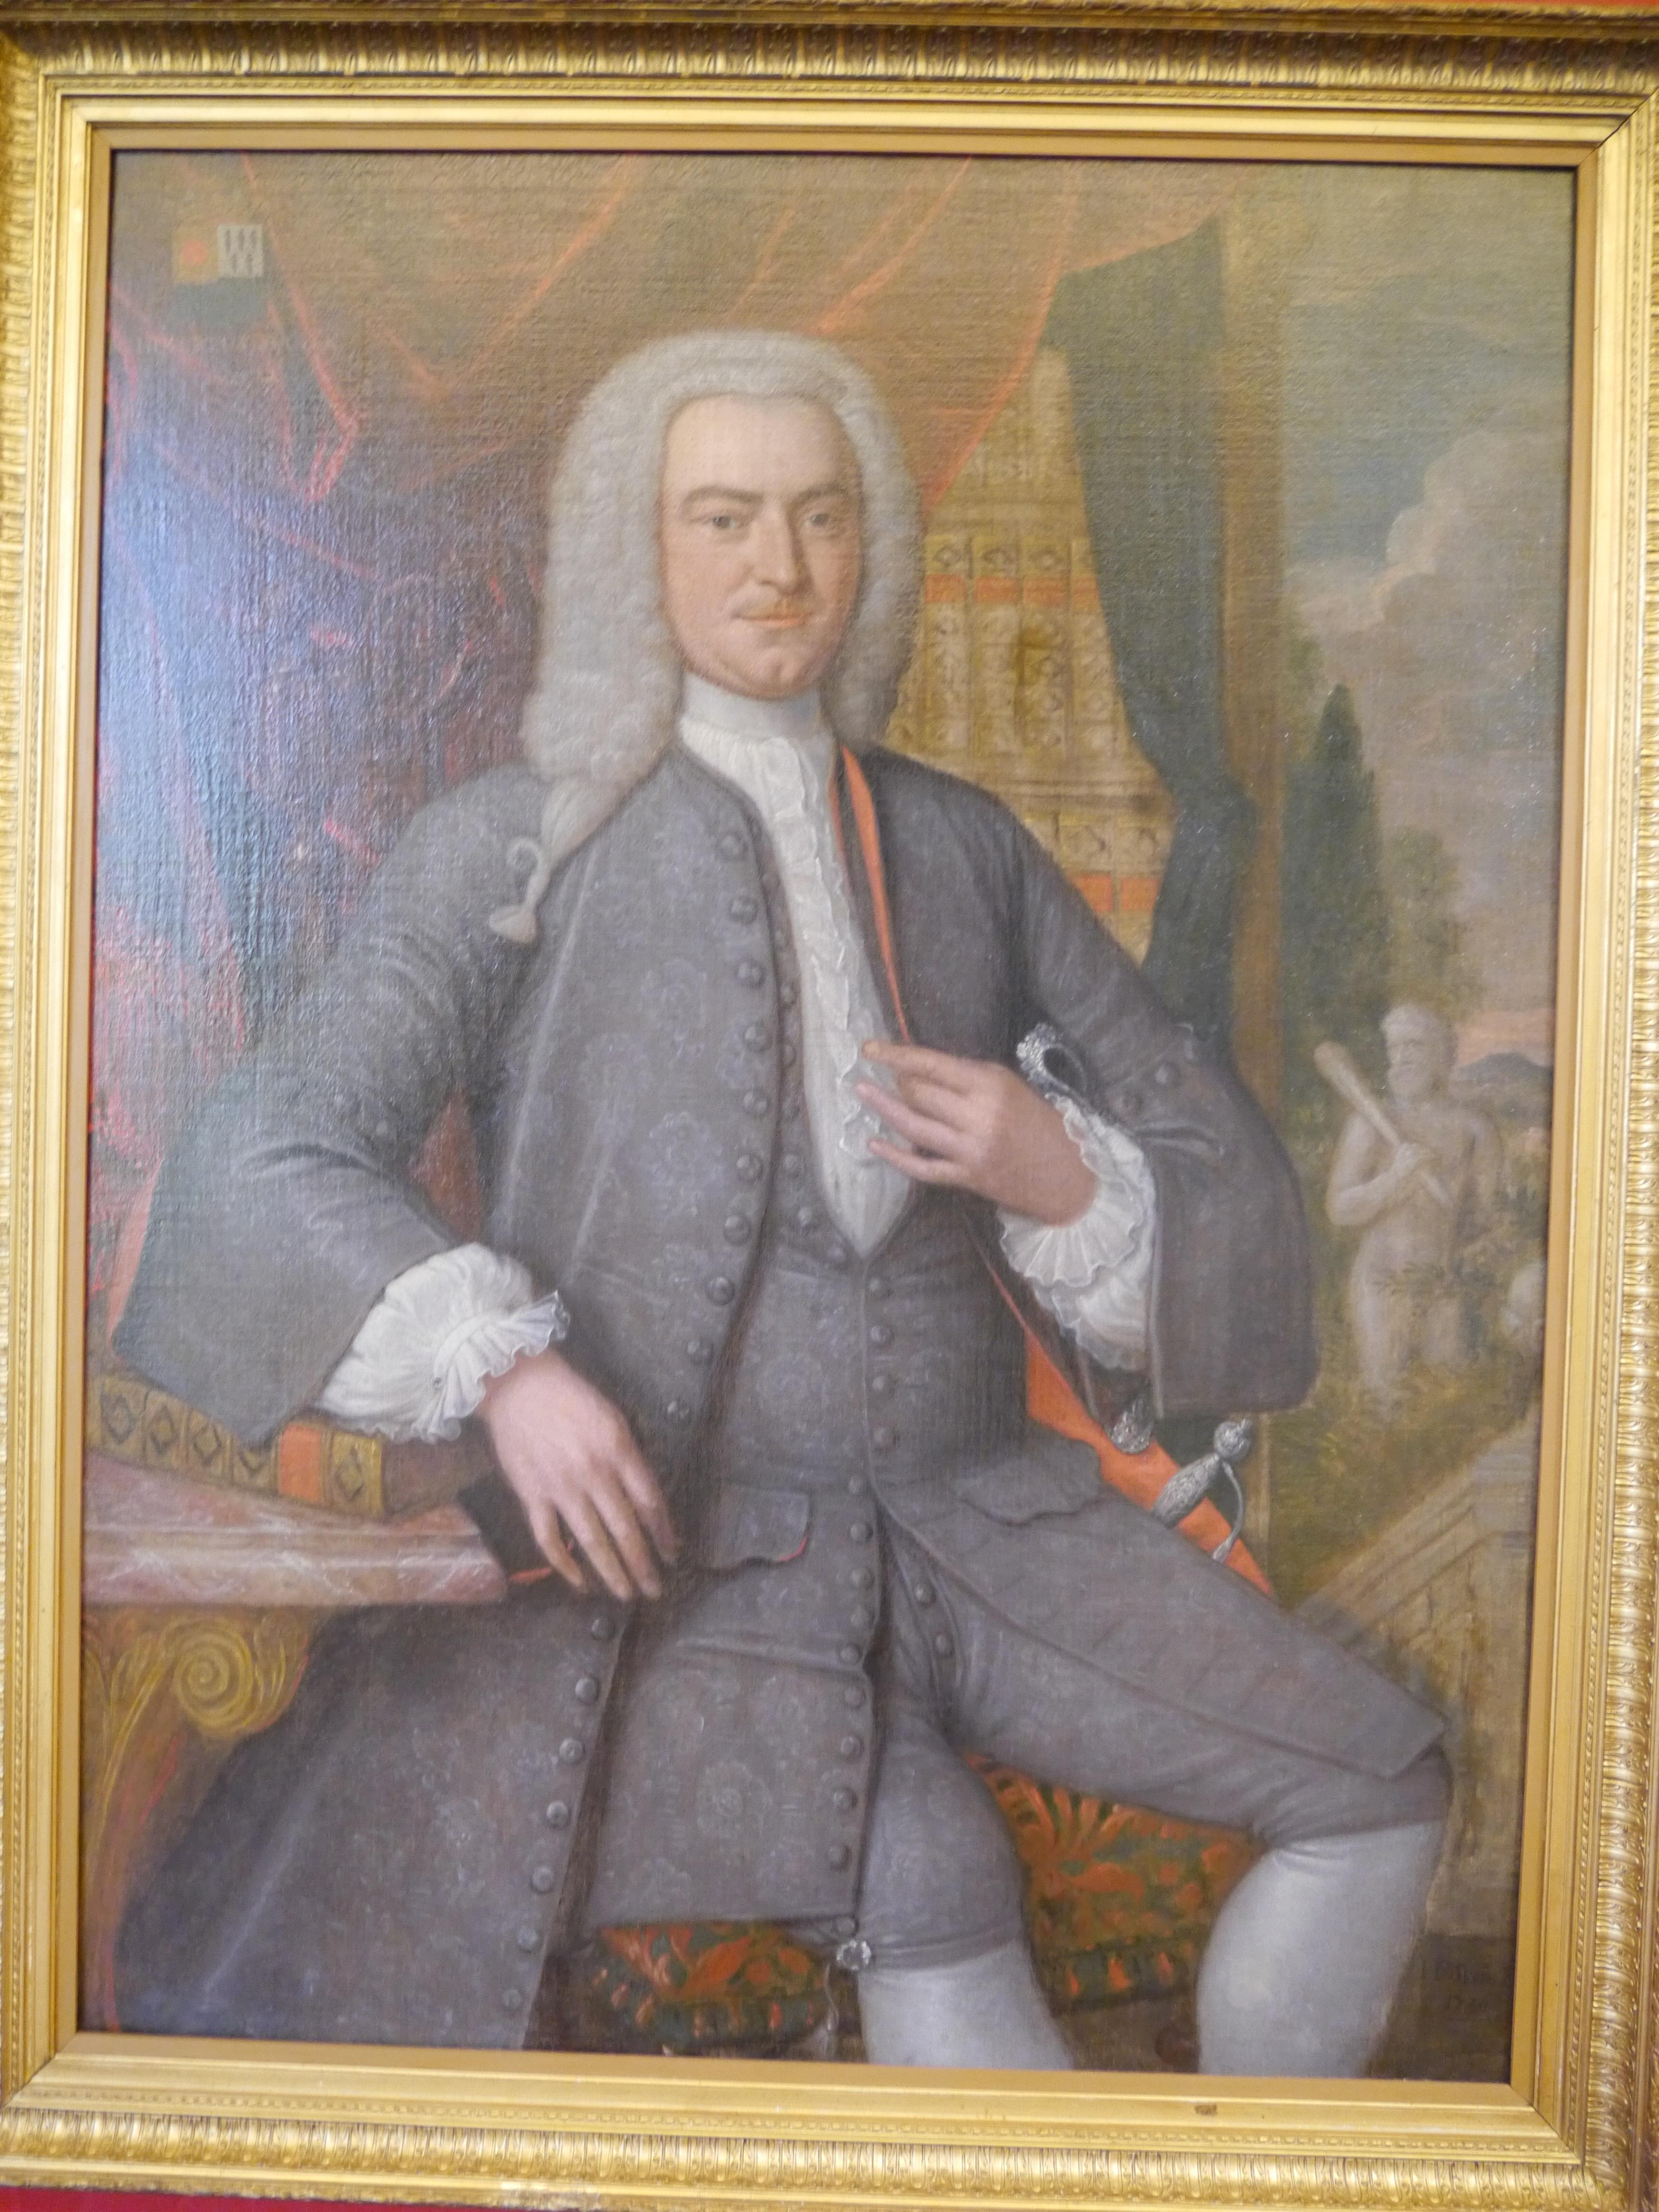 15_portret_hubertus_-snoeck_1703-1773